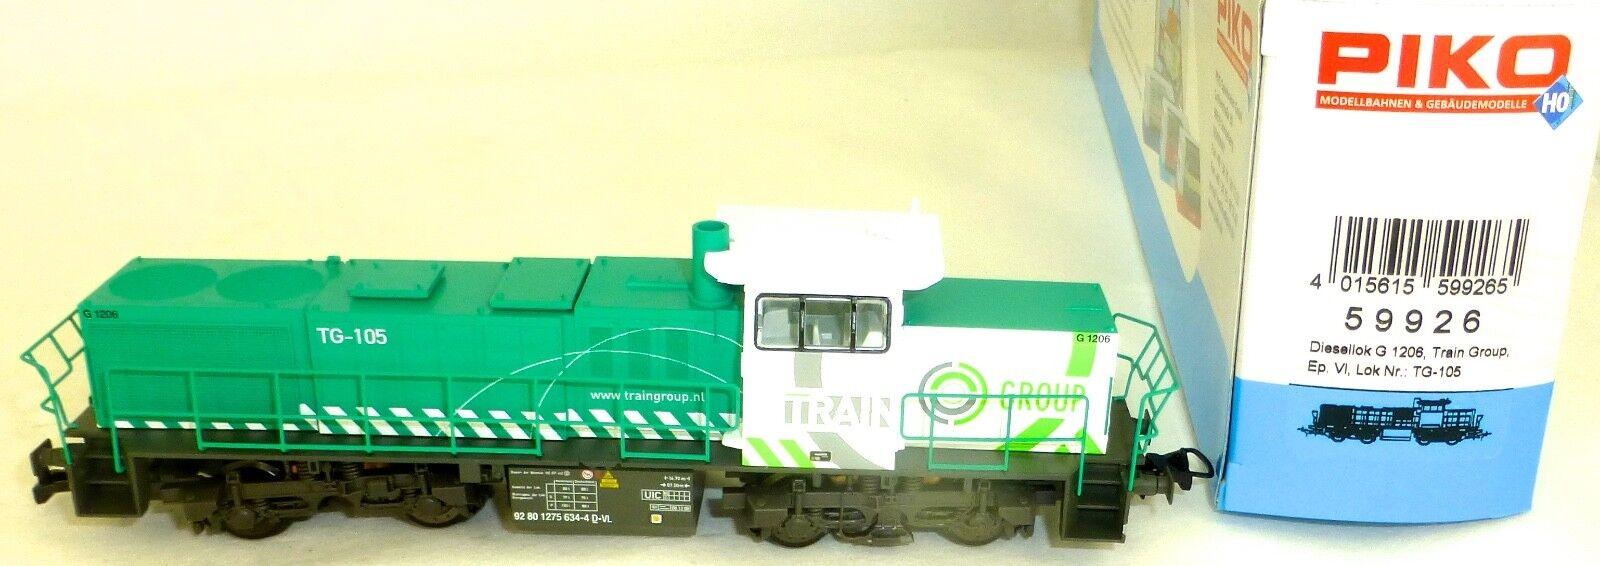 G 1206 Train Group tg-105 DIESEL epvi PIKO 59926 h0 1:87 OVP hh4 µ *